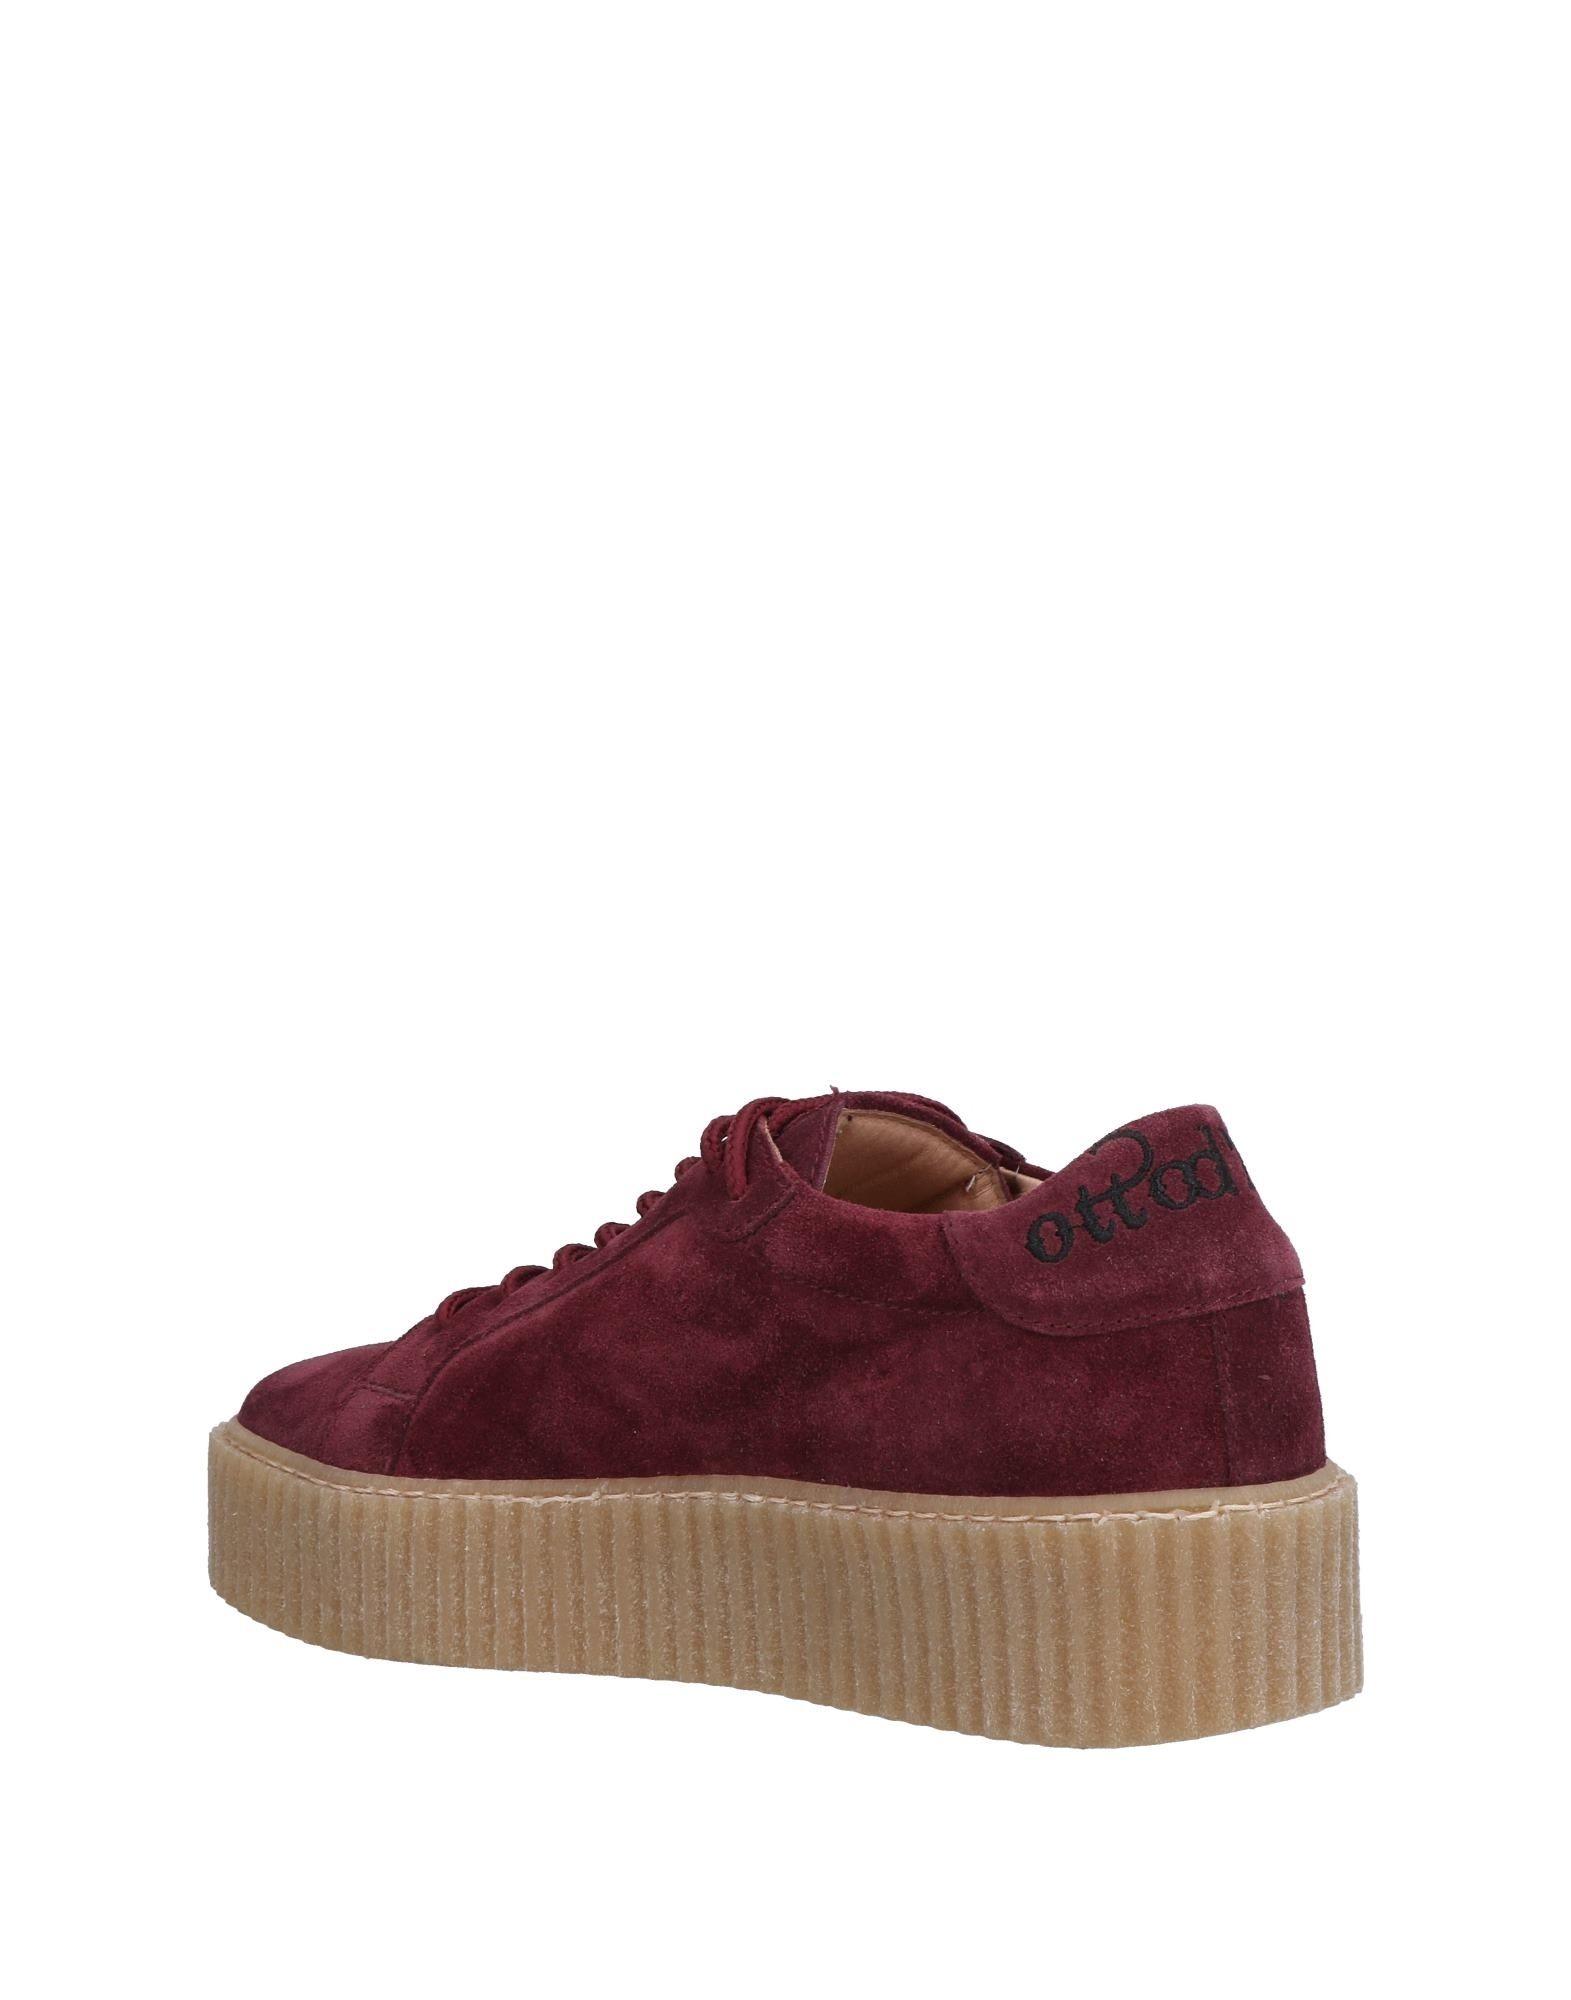 Ottod'ame Sneakers Damen  beliebte 11479617NM Gute Qualität beliebte  Schuhe 120f32